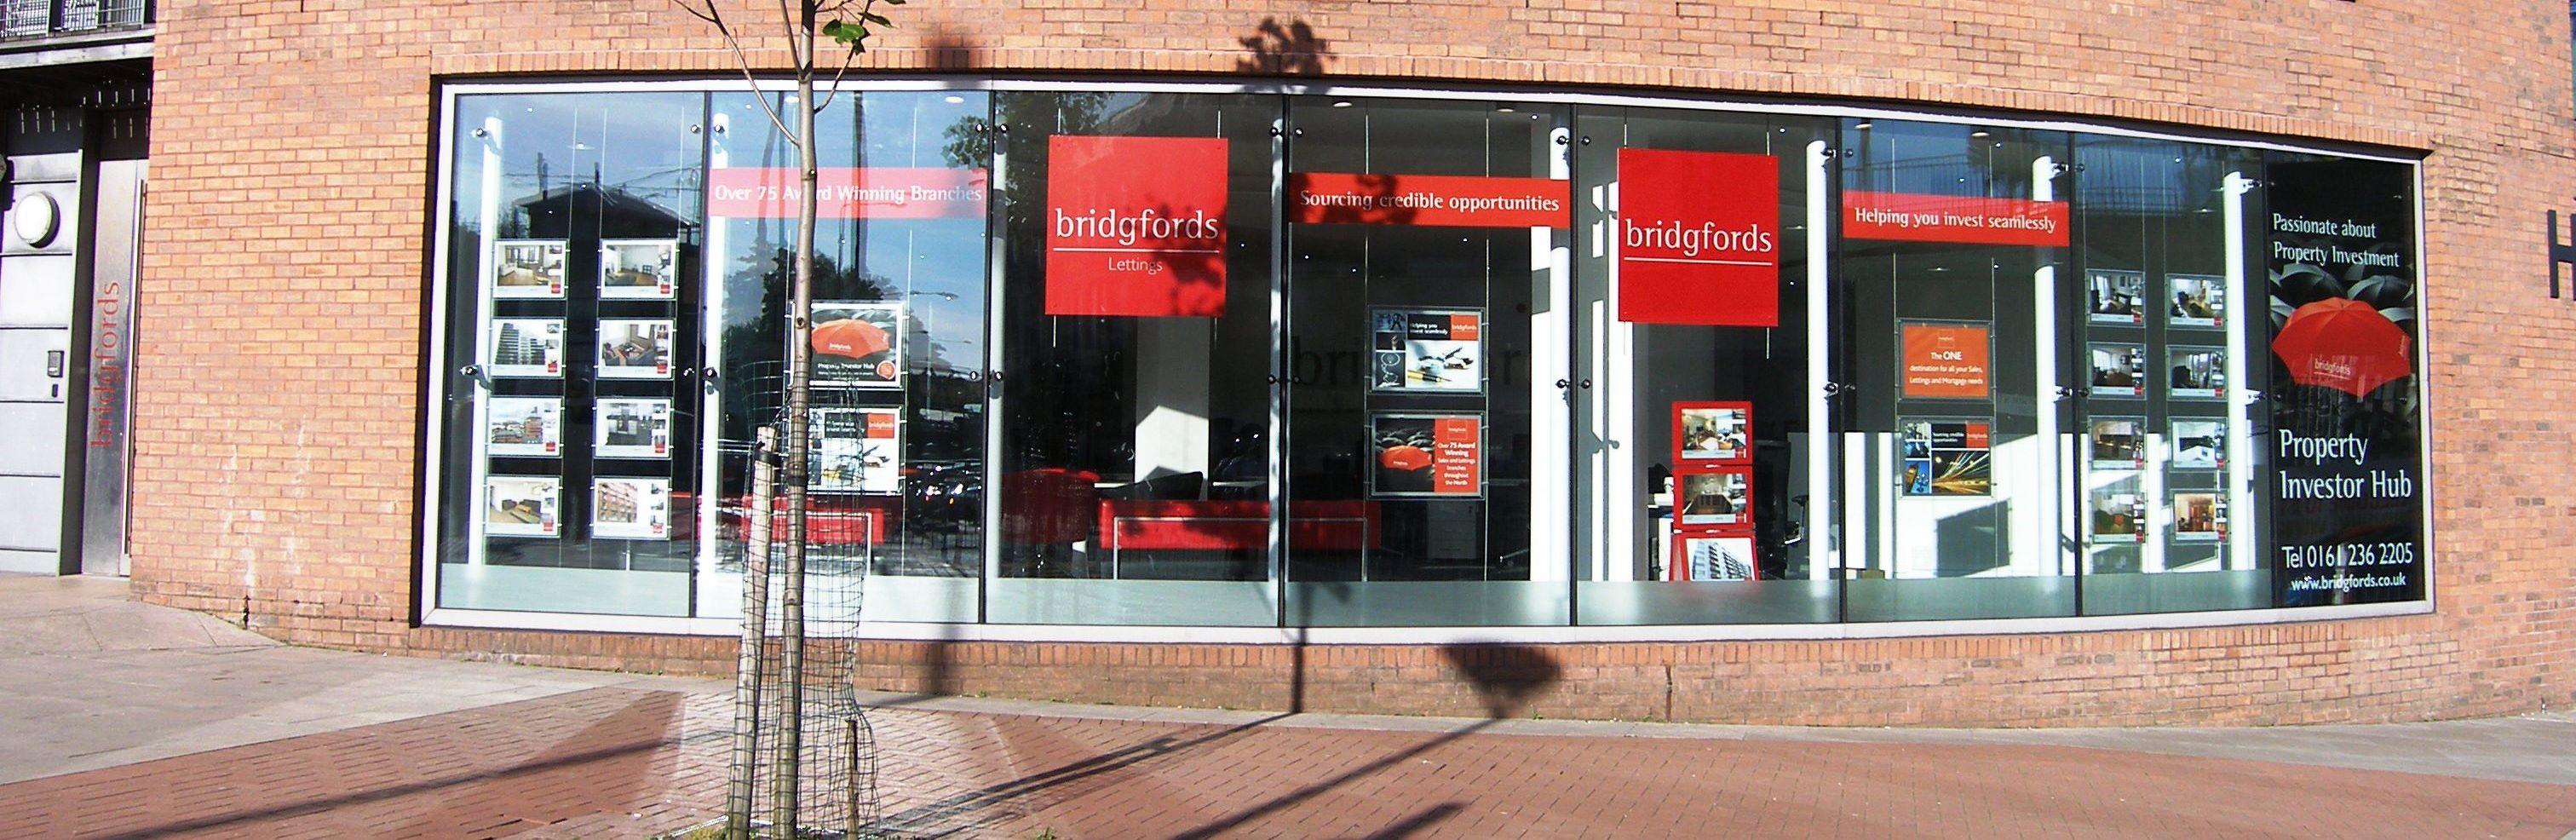 Bridgfords Estate Agents Manchester